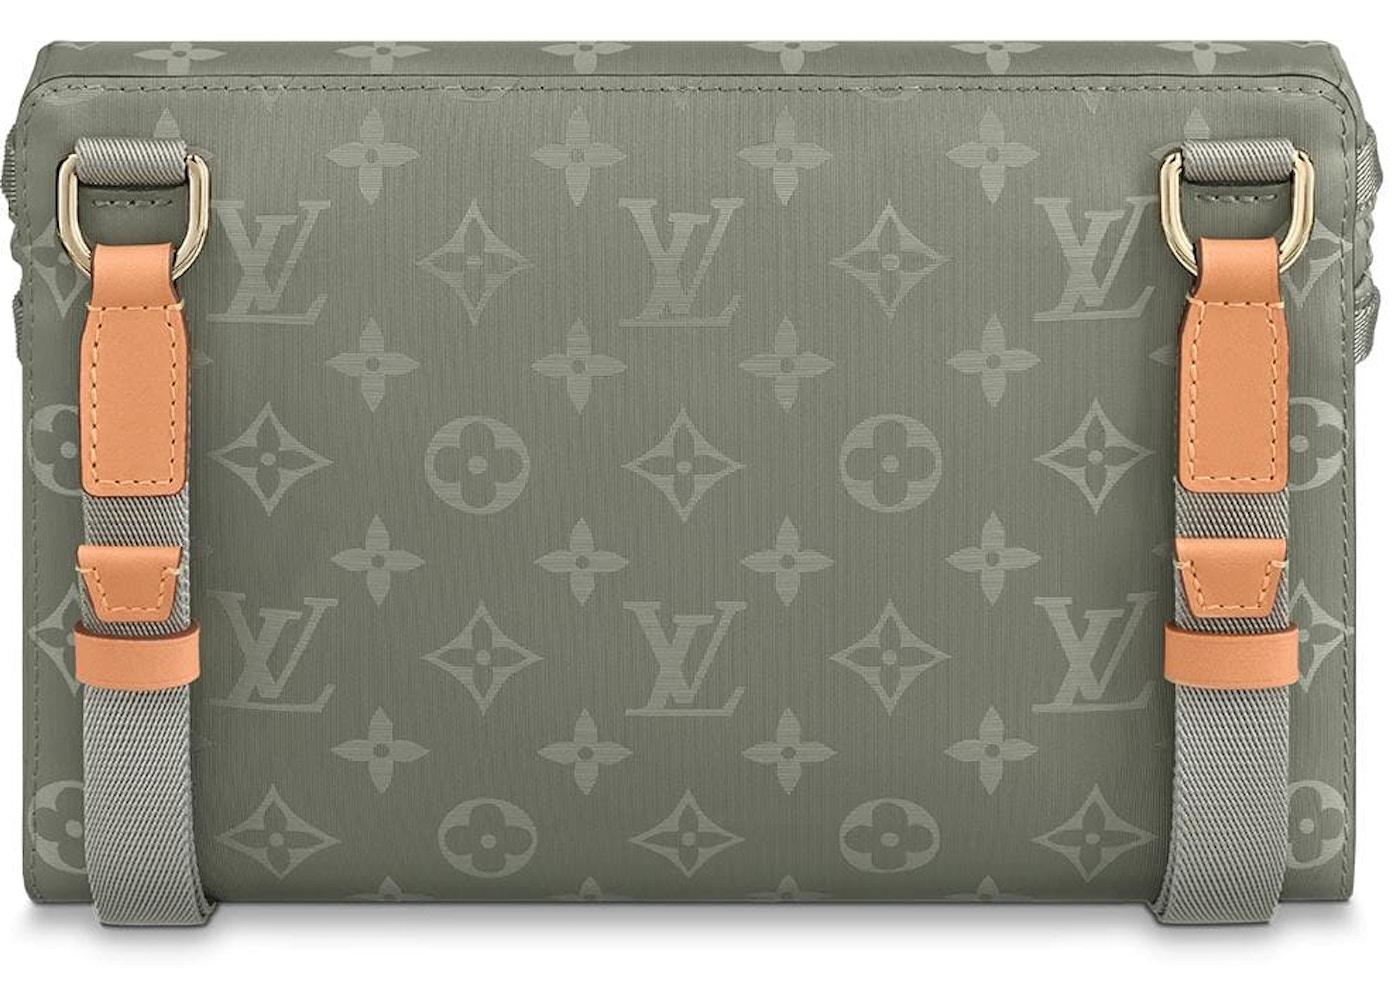 c9c04a70dd6 Buy   Sell Luxury Handbags